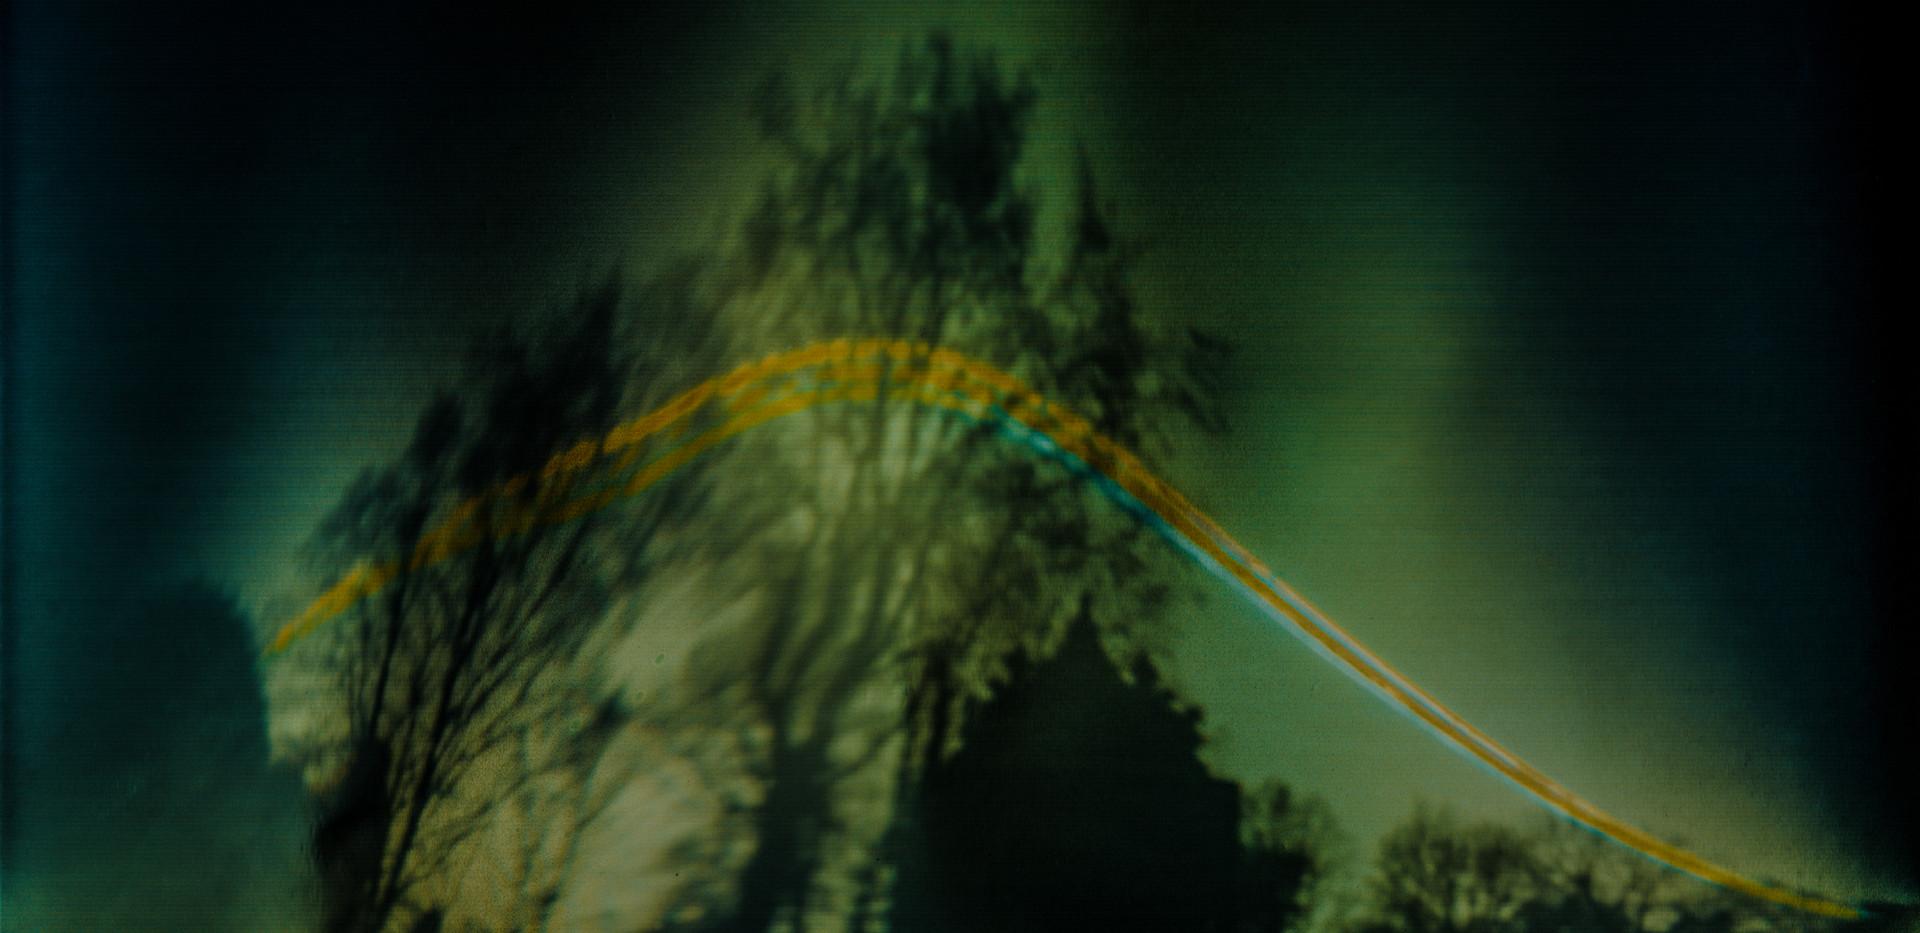 Solarigrafia / Solargraphy